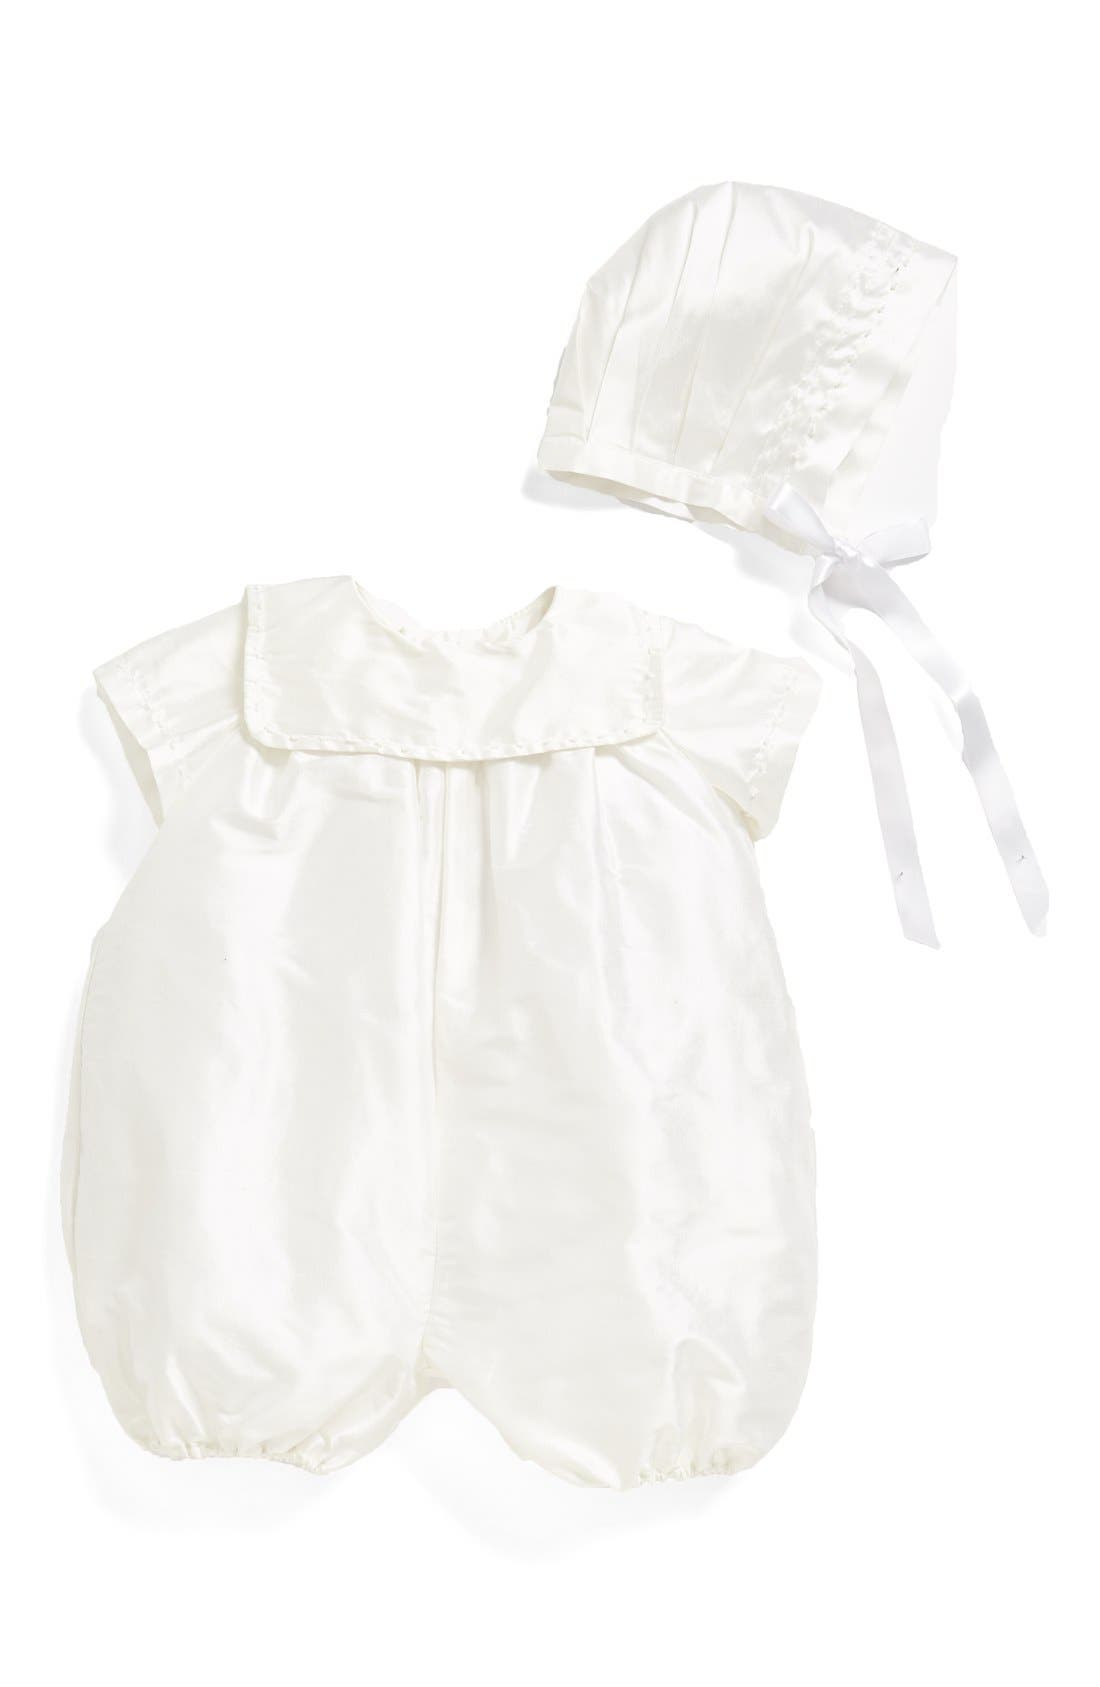 'Charming' Silk Romper & Bonnet,                             Main thumbnail 1, color,                             WHITE